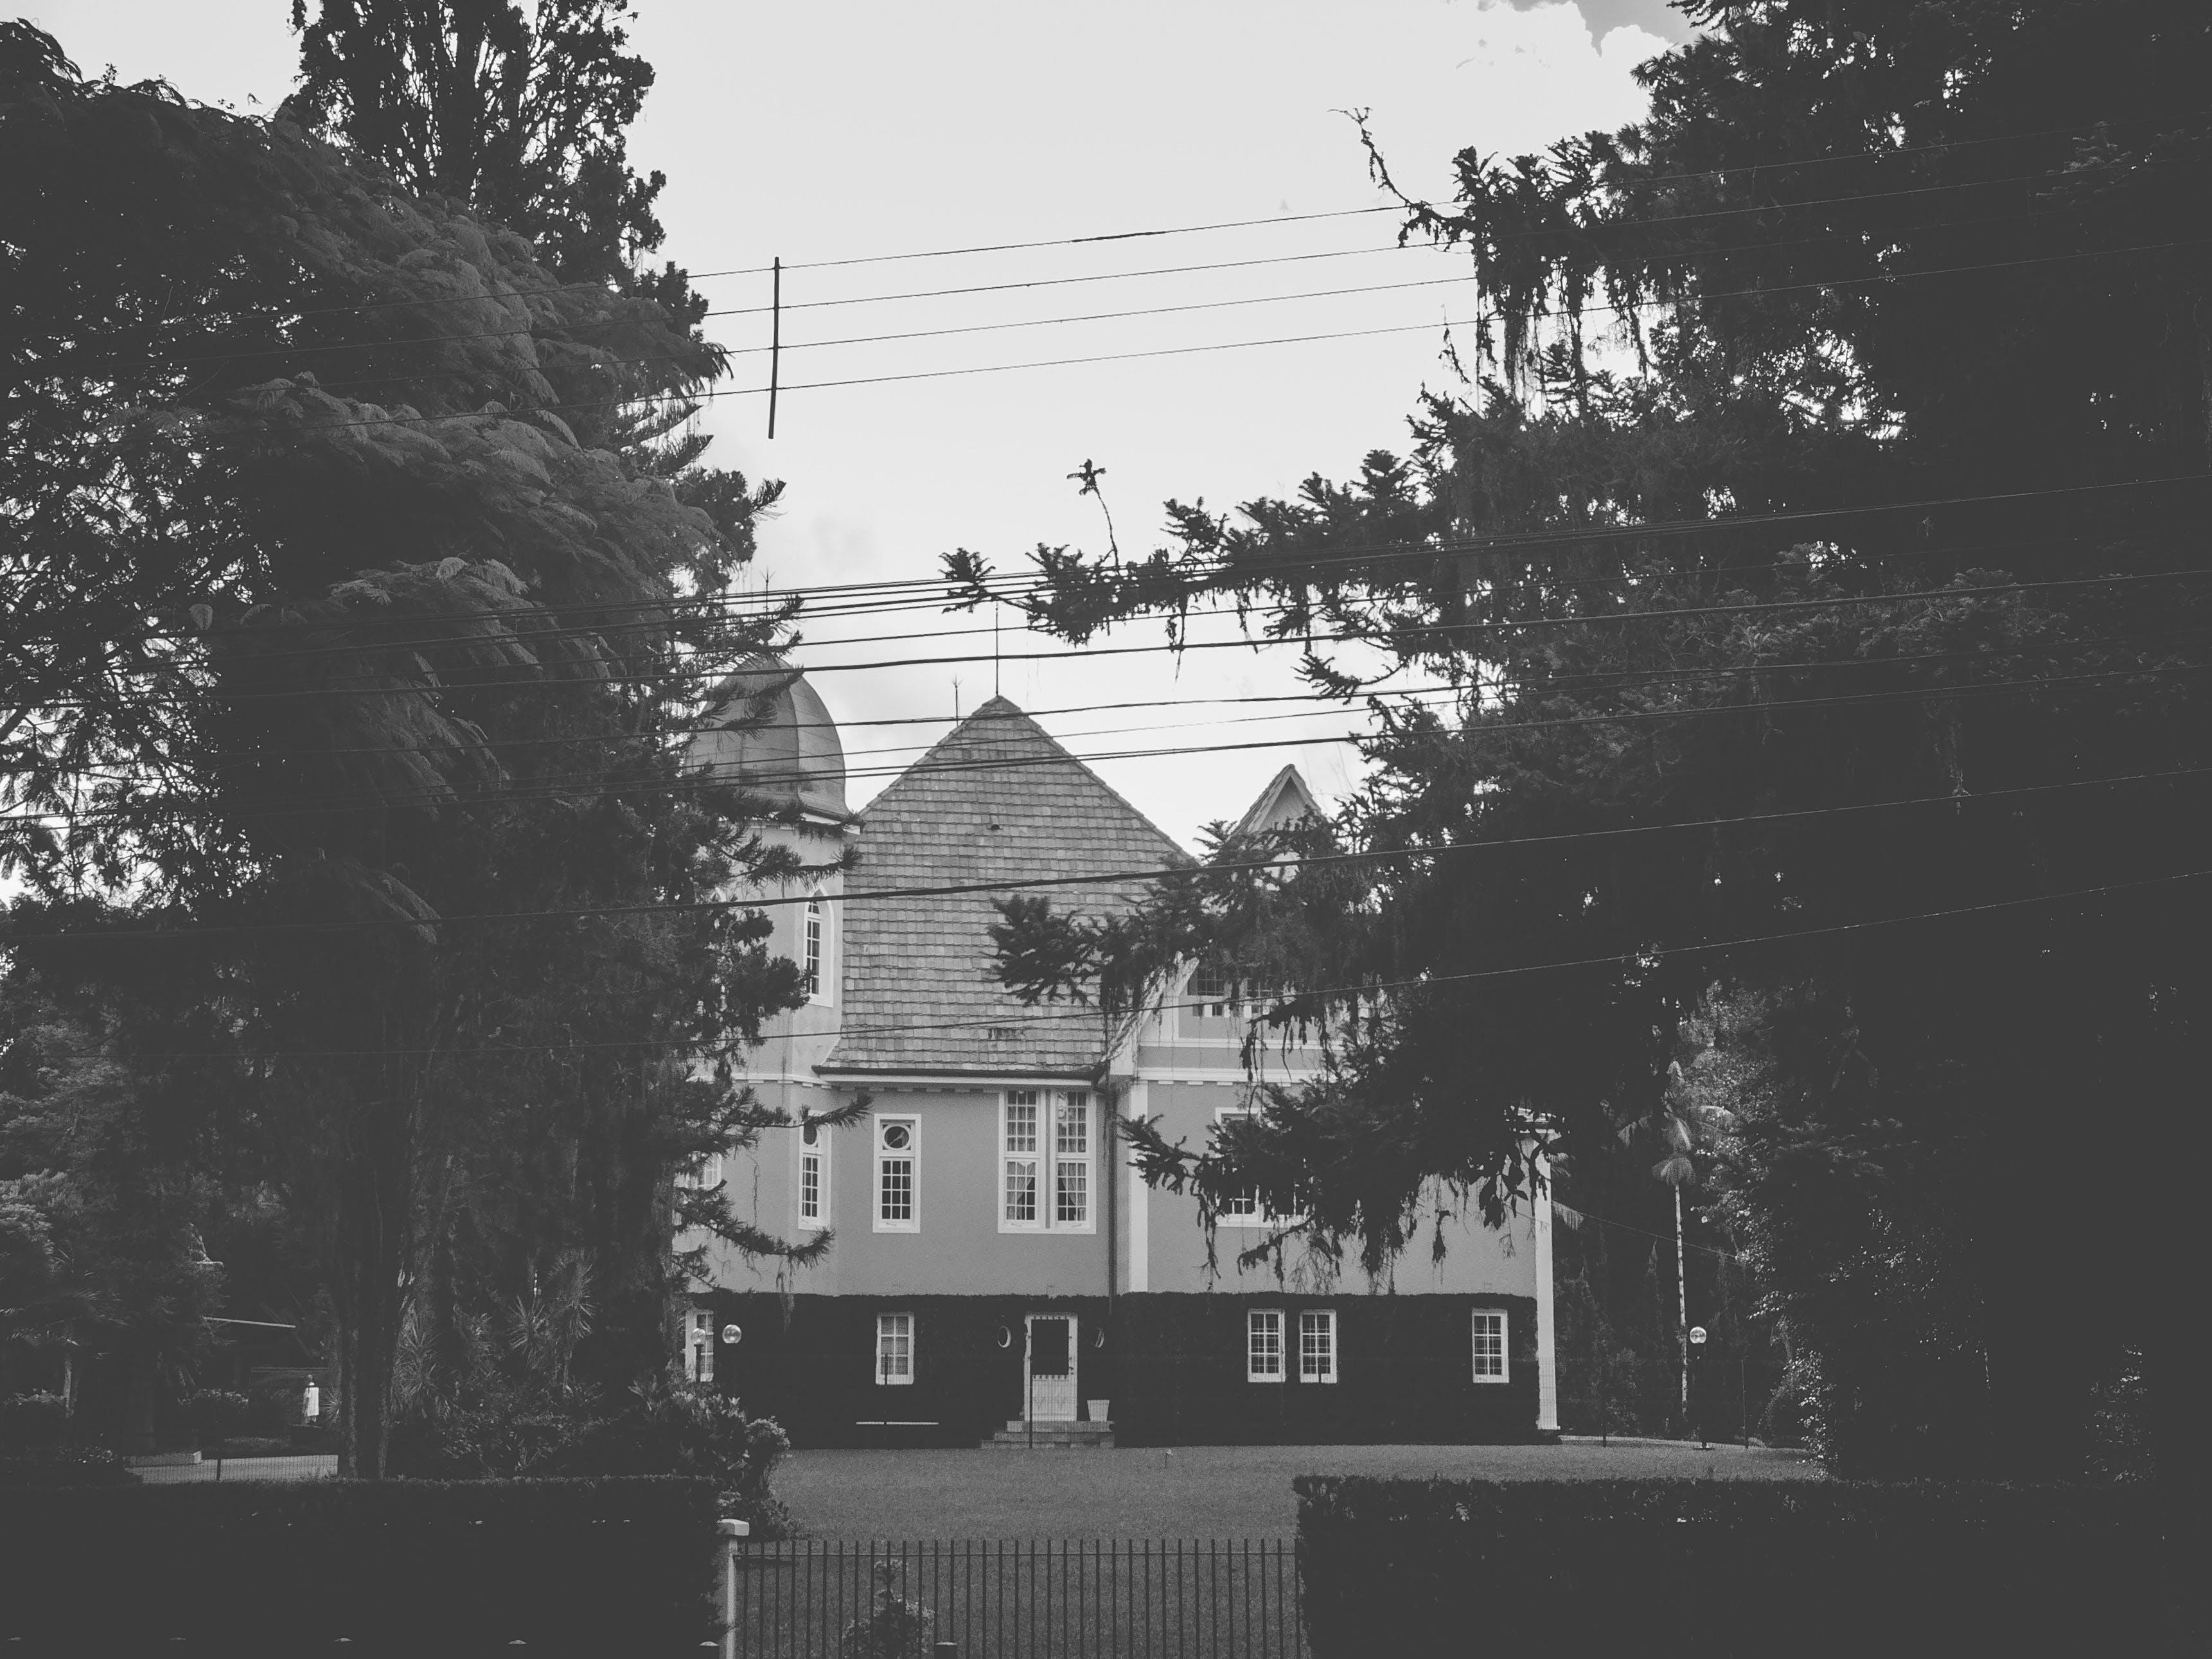 Grayscale Photo of White Concrete Building